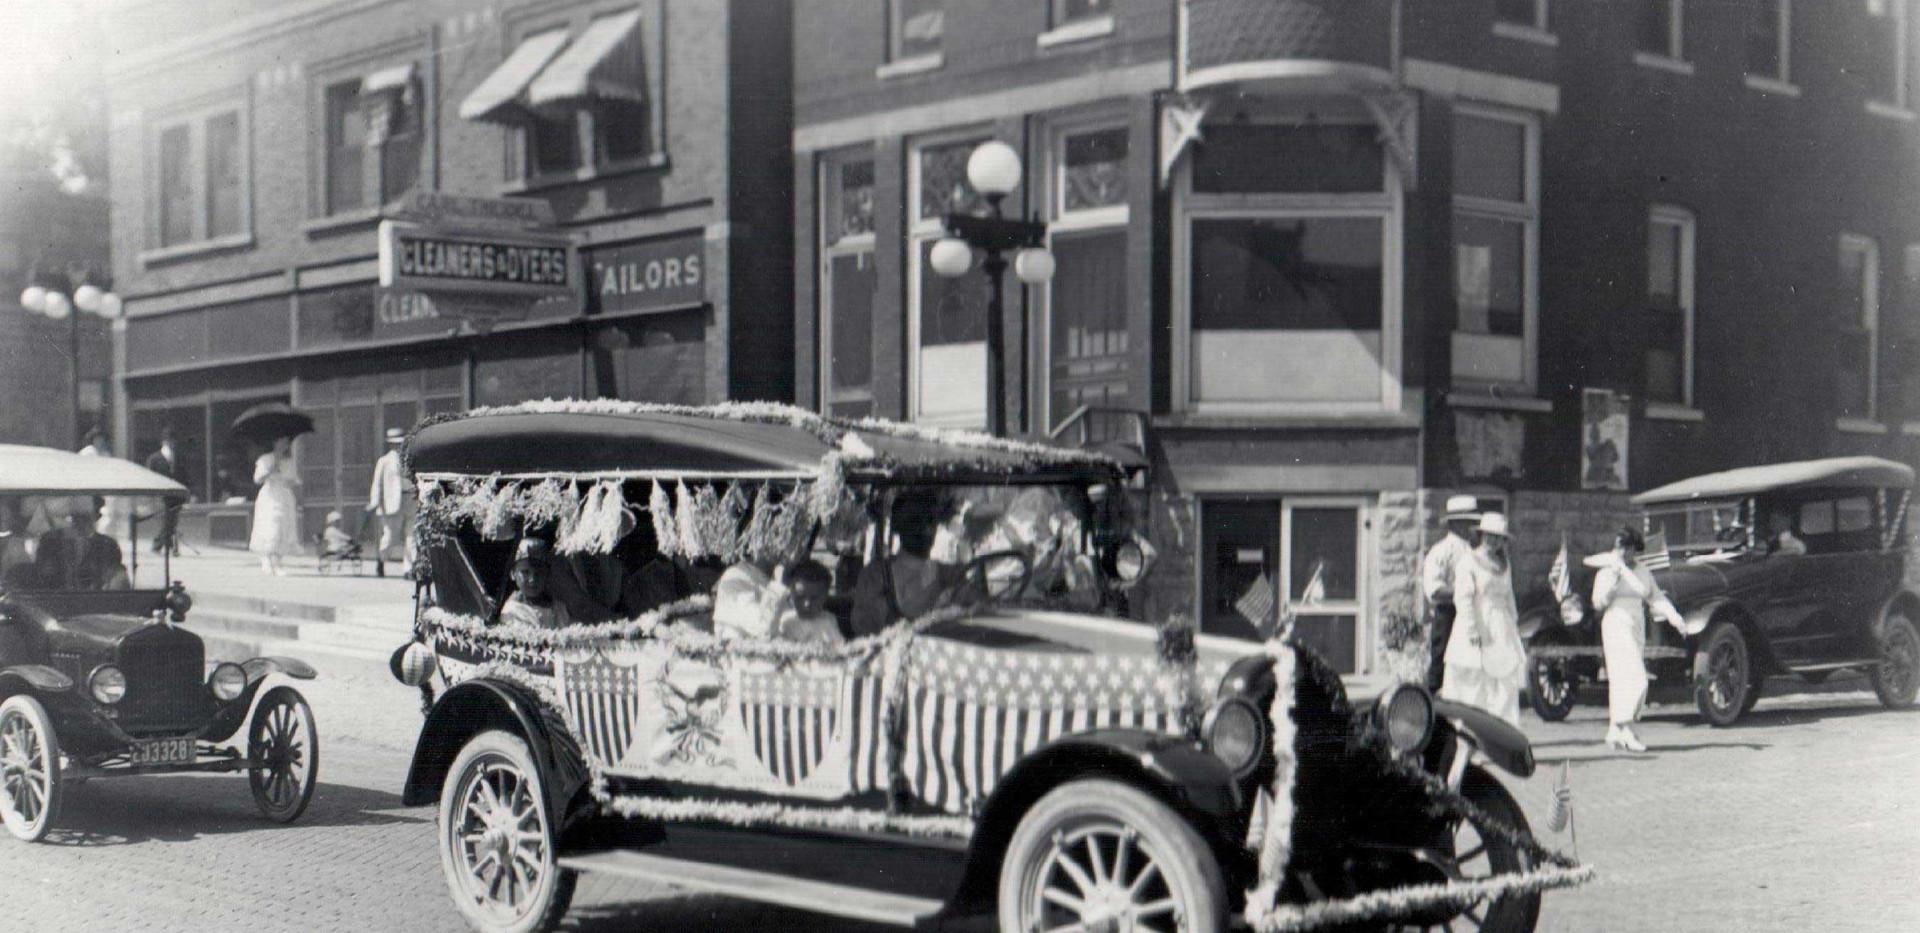 Parade_Kammeyers_Automobile_1919.jpg